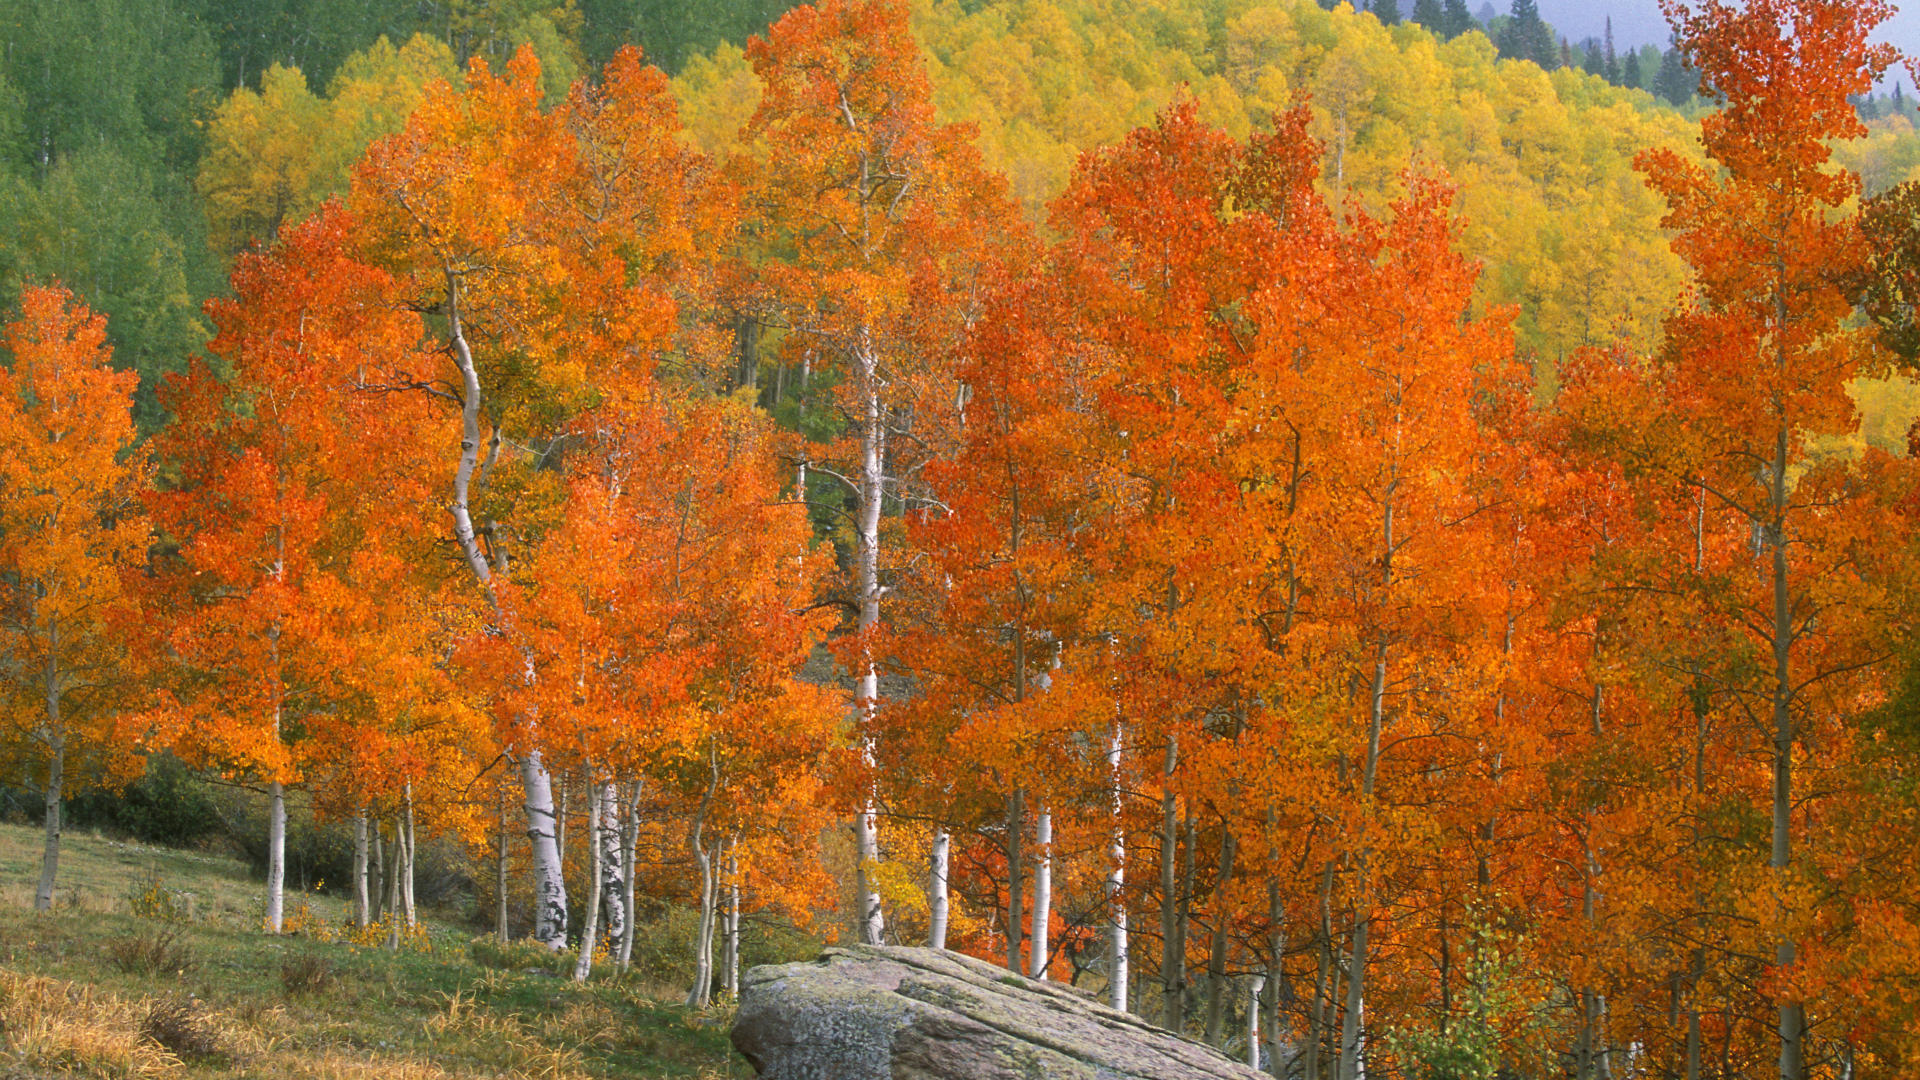 download backgrounds colorado creek background aspens desktop 1920x1080